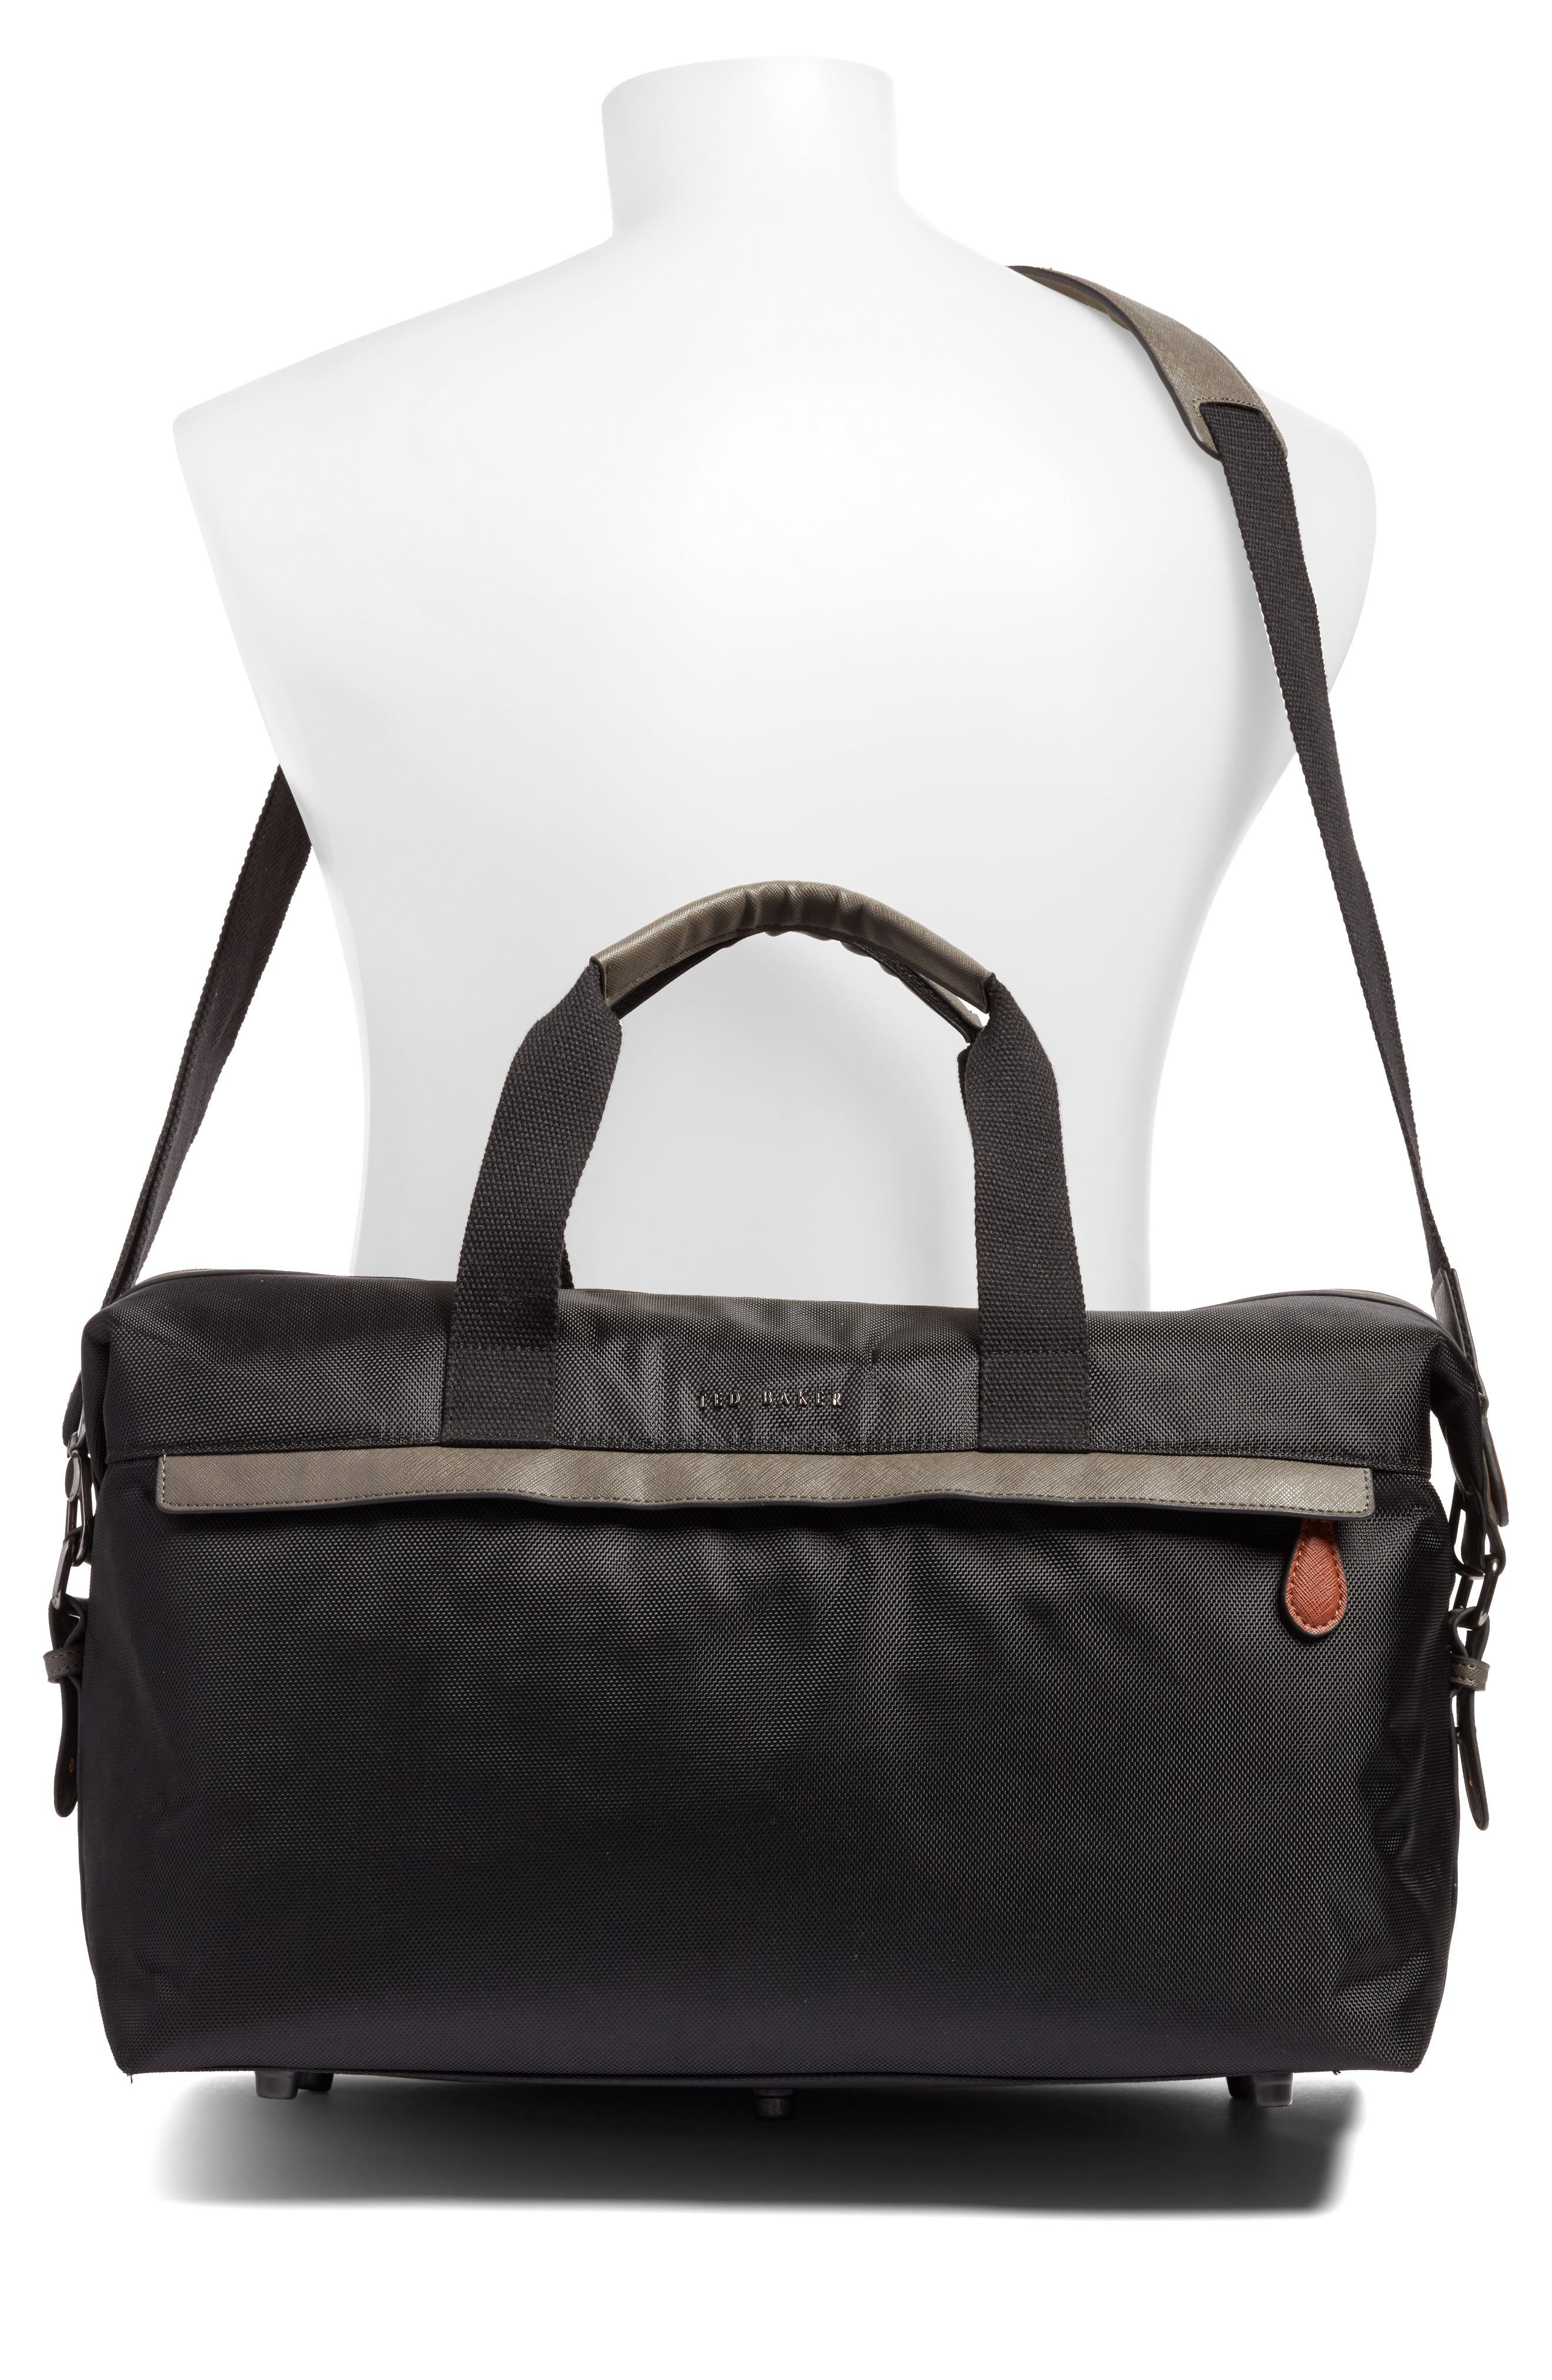 Zeebee Duffel Bag,                             Alternate thumbnail 2, color,                             Black